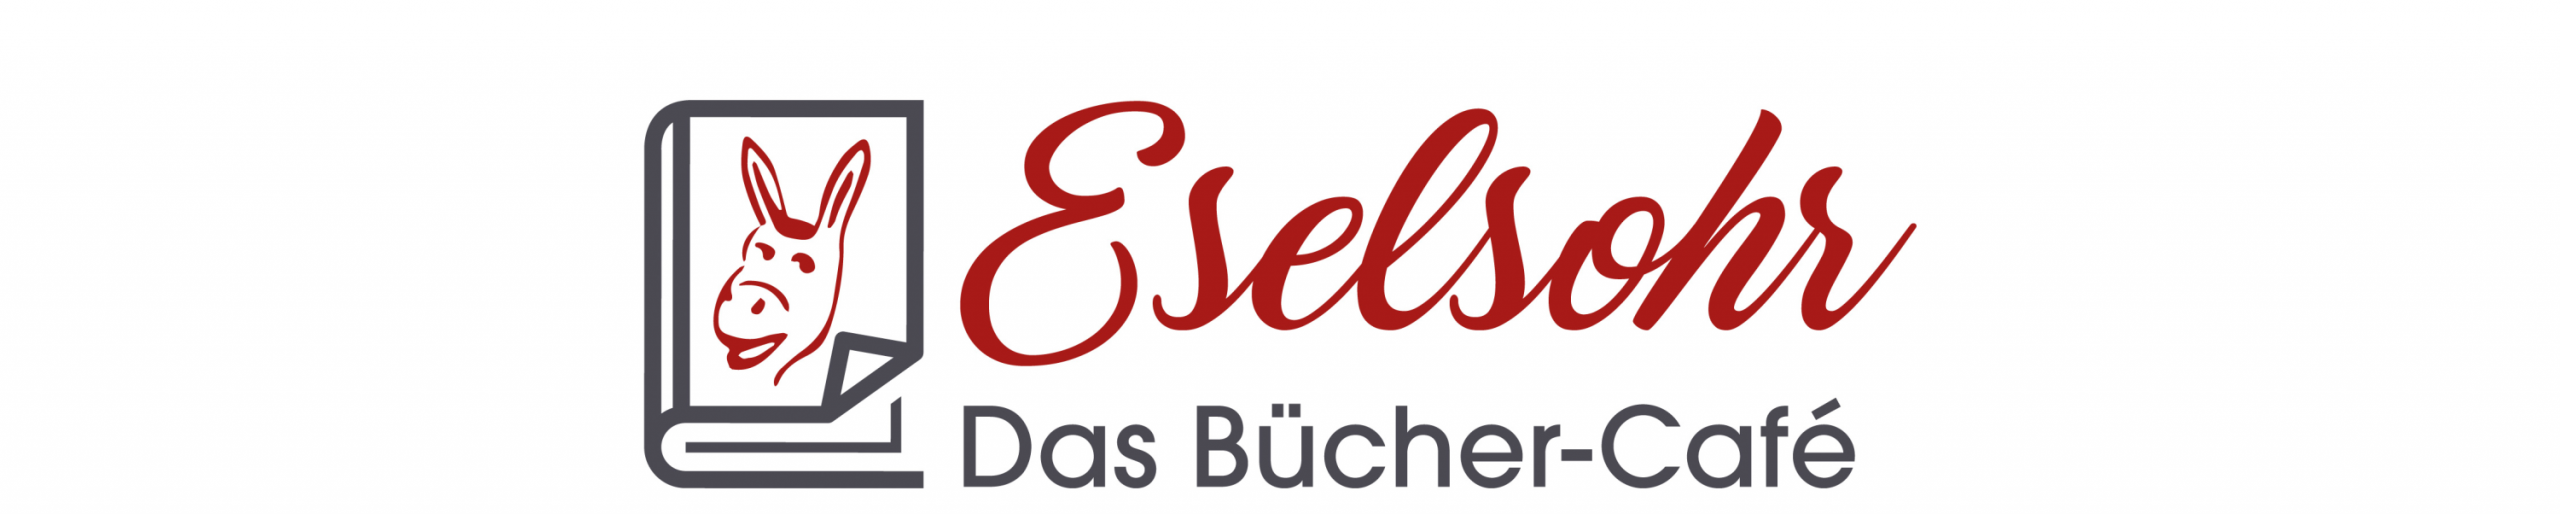 Eselsohr Dornholzhausen